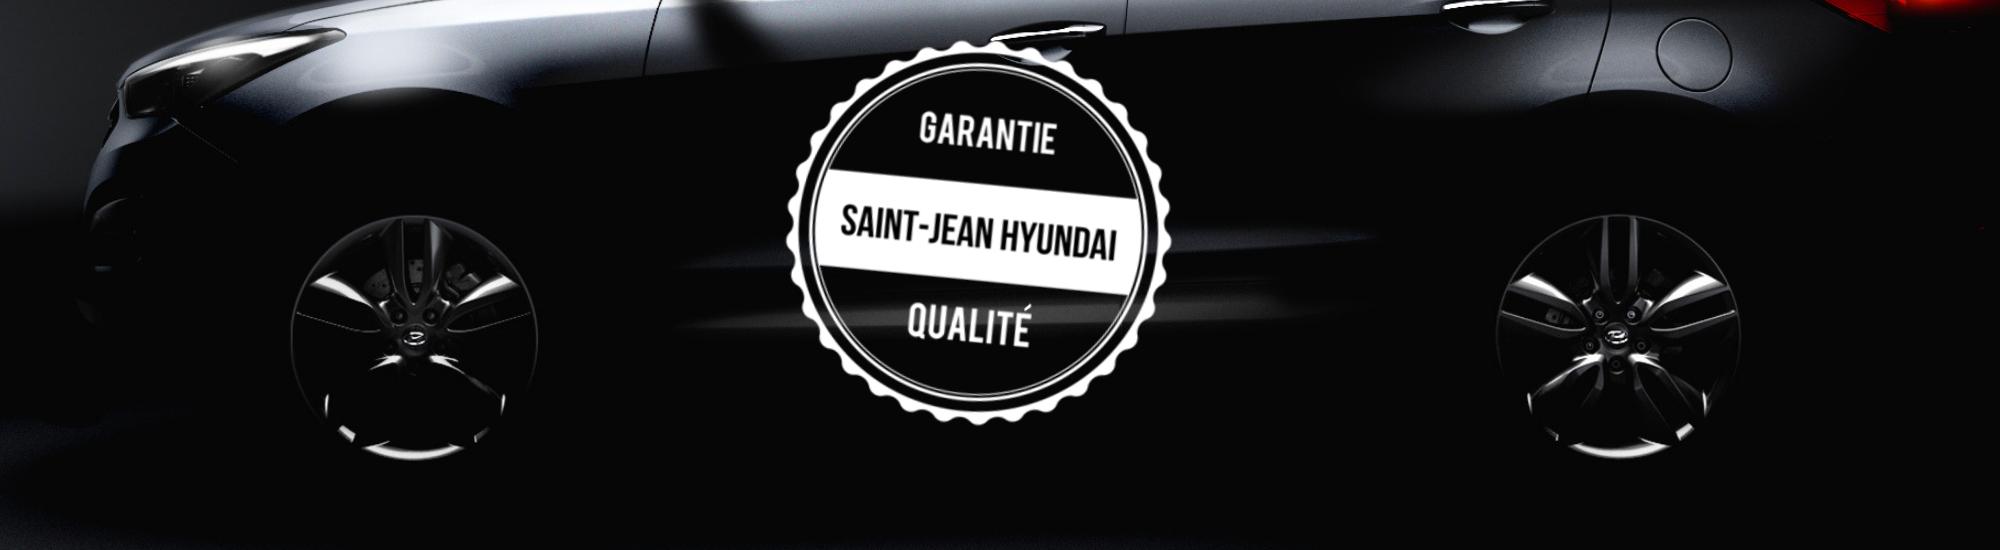 Qualité Garantie!